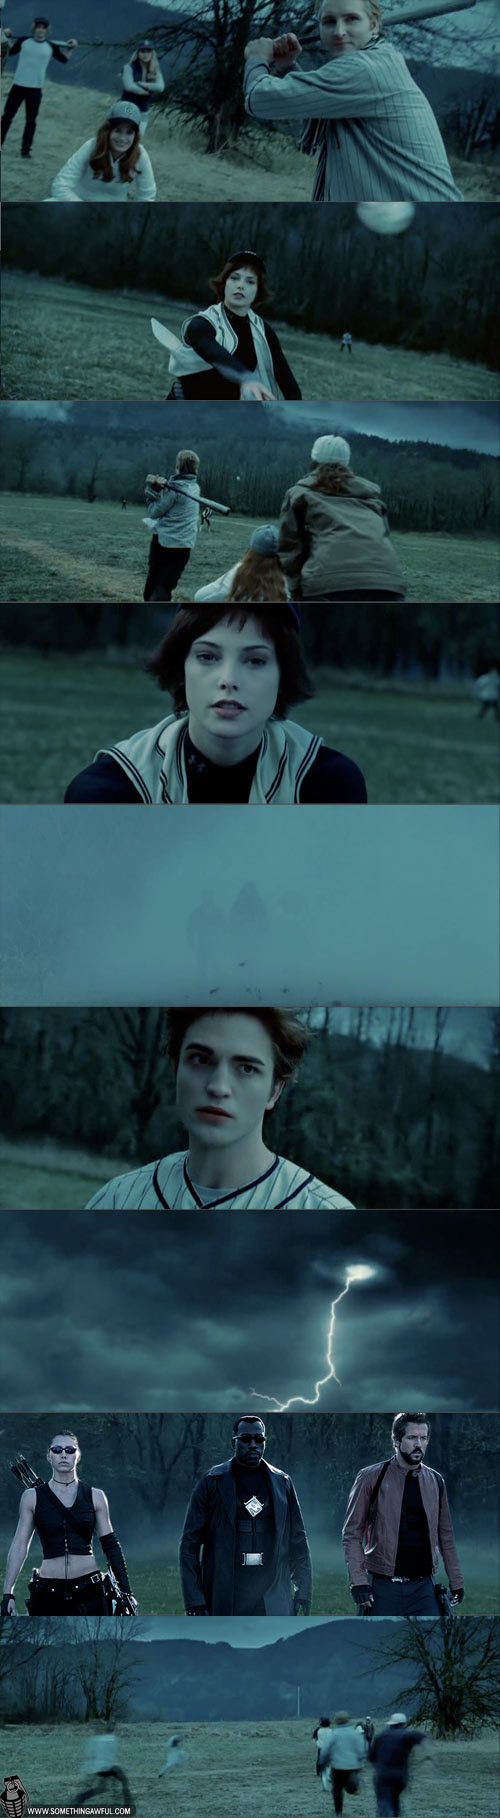 Adegan Twilight Ada yang Disensor